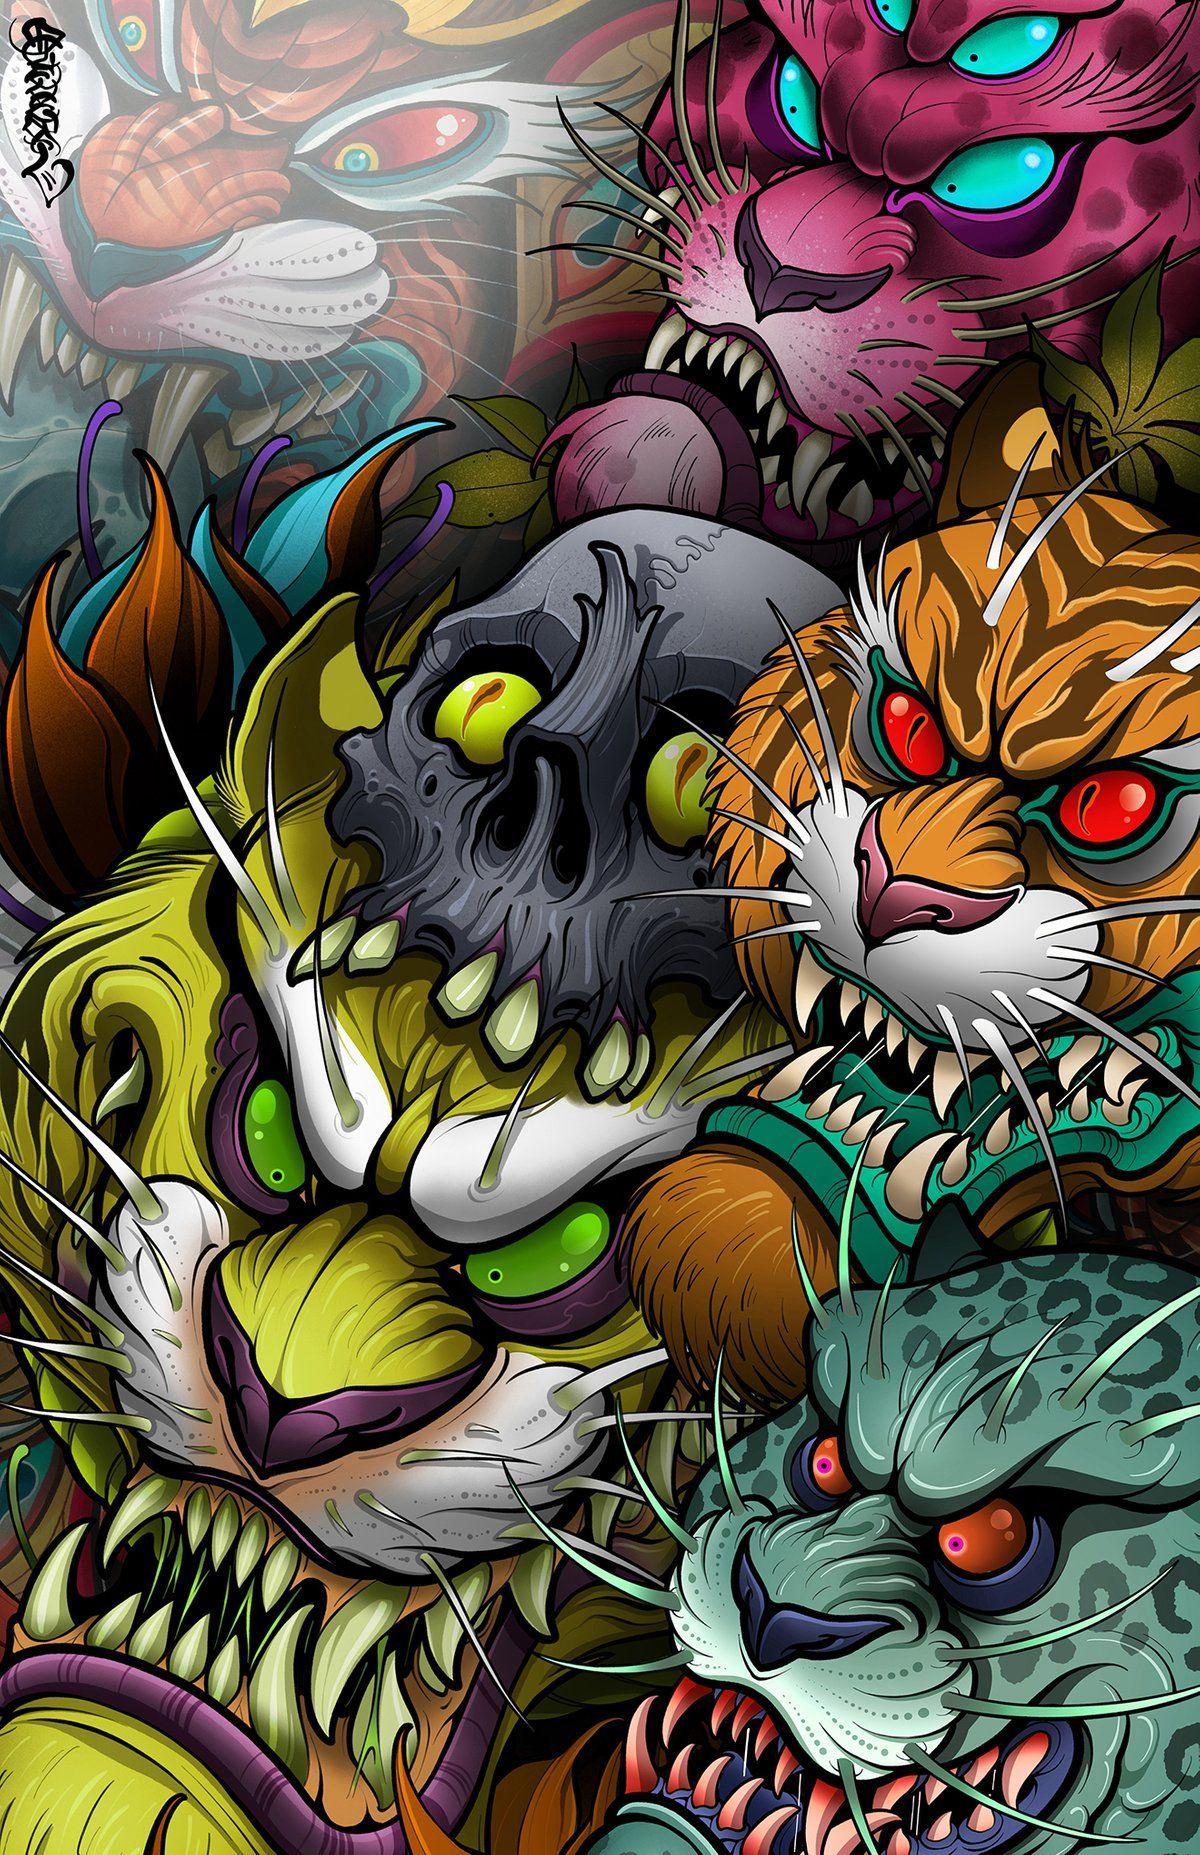 Image Of Cat Pile Japanese Tattoo Art Samurai Art Pop Art Wallpaper